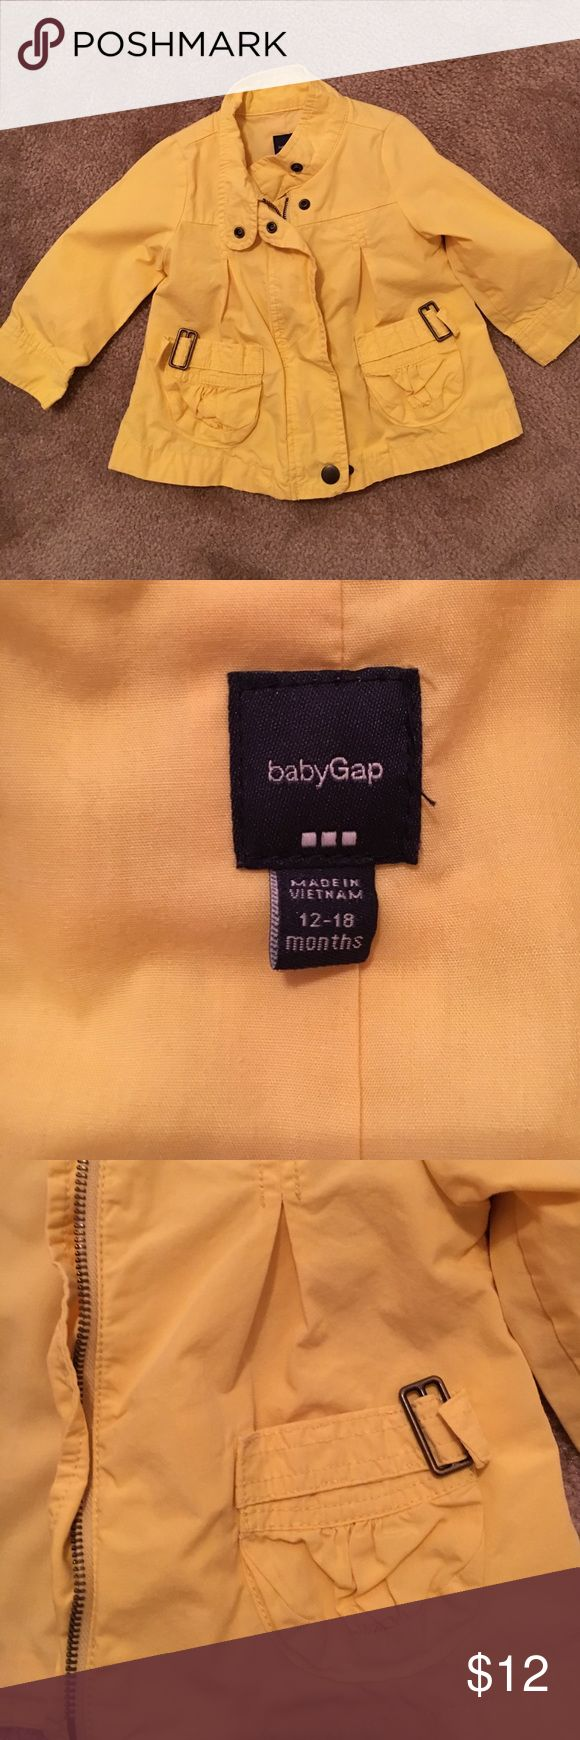 Gap jacket 12-18 month girls Gap jacket 12-18 month jacket in perfect condition. So cute! GAP Jackets & Coats